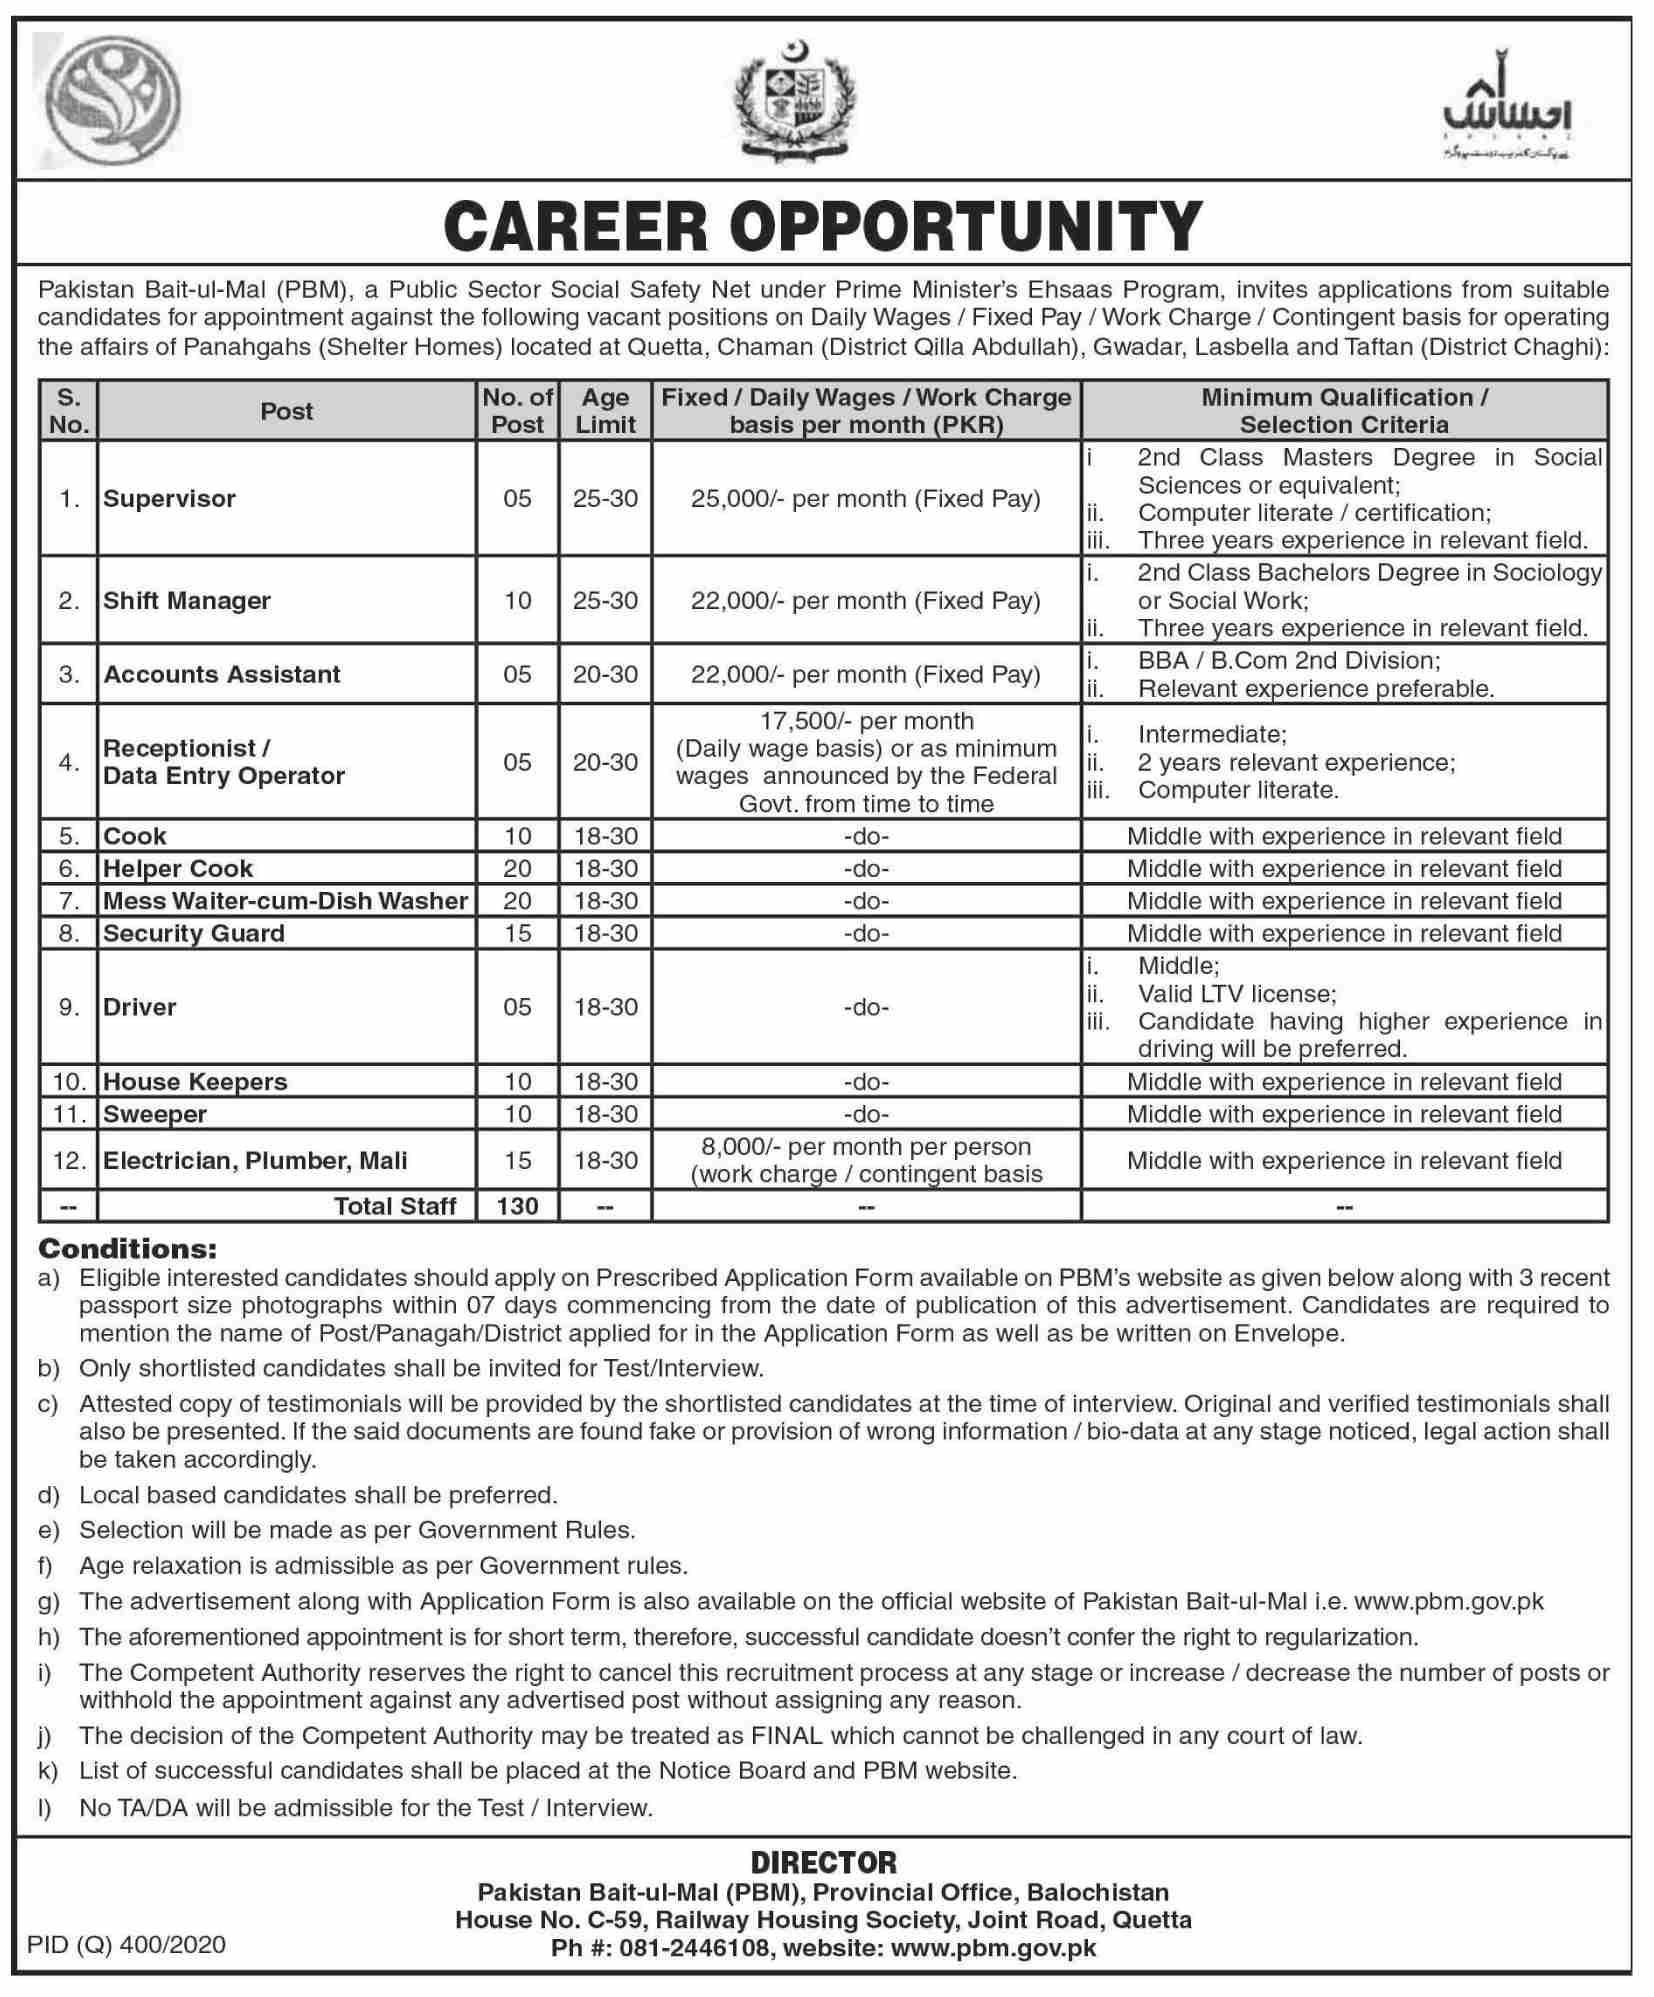 Pakistan Bait ul Mal November 2020 Jobs in Pakistan 2020